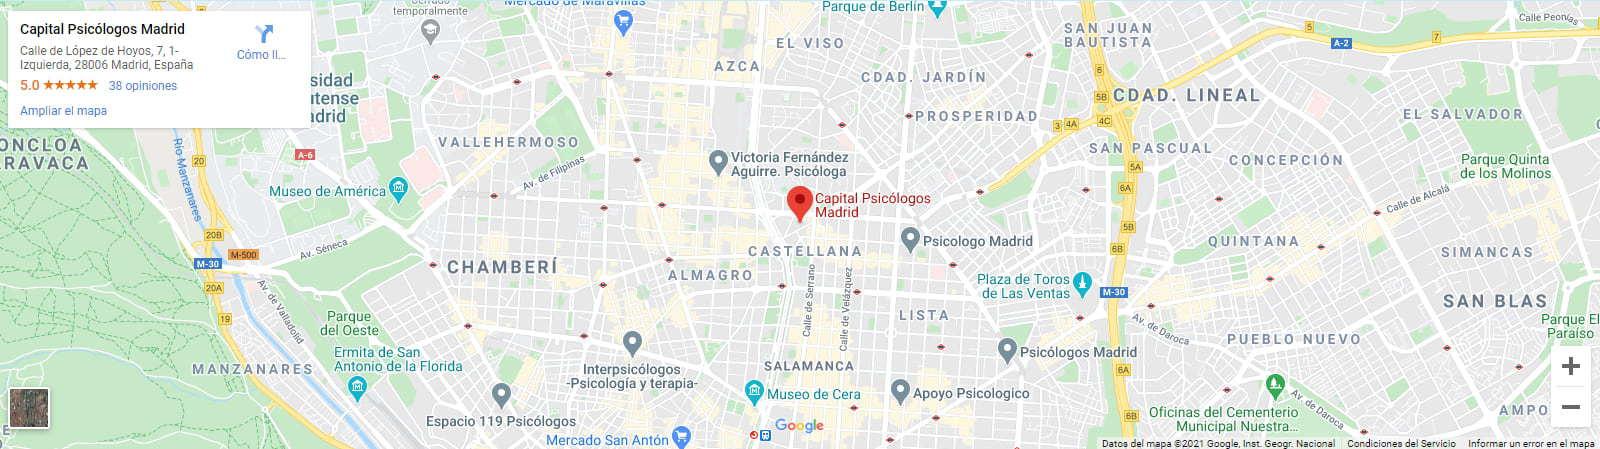 ubicacion-capital-psicologos